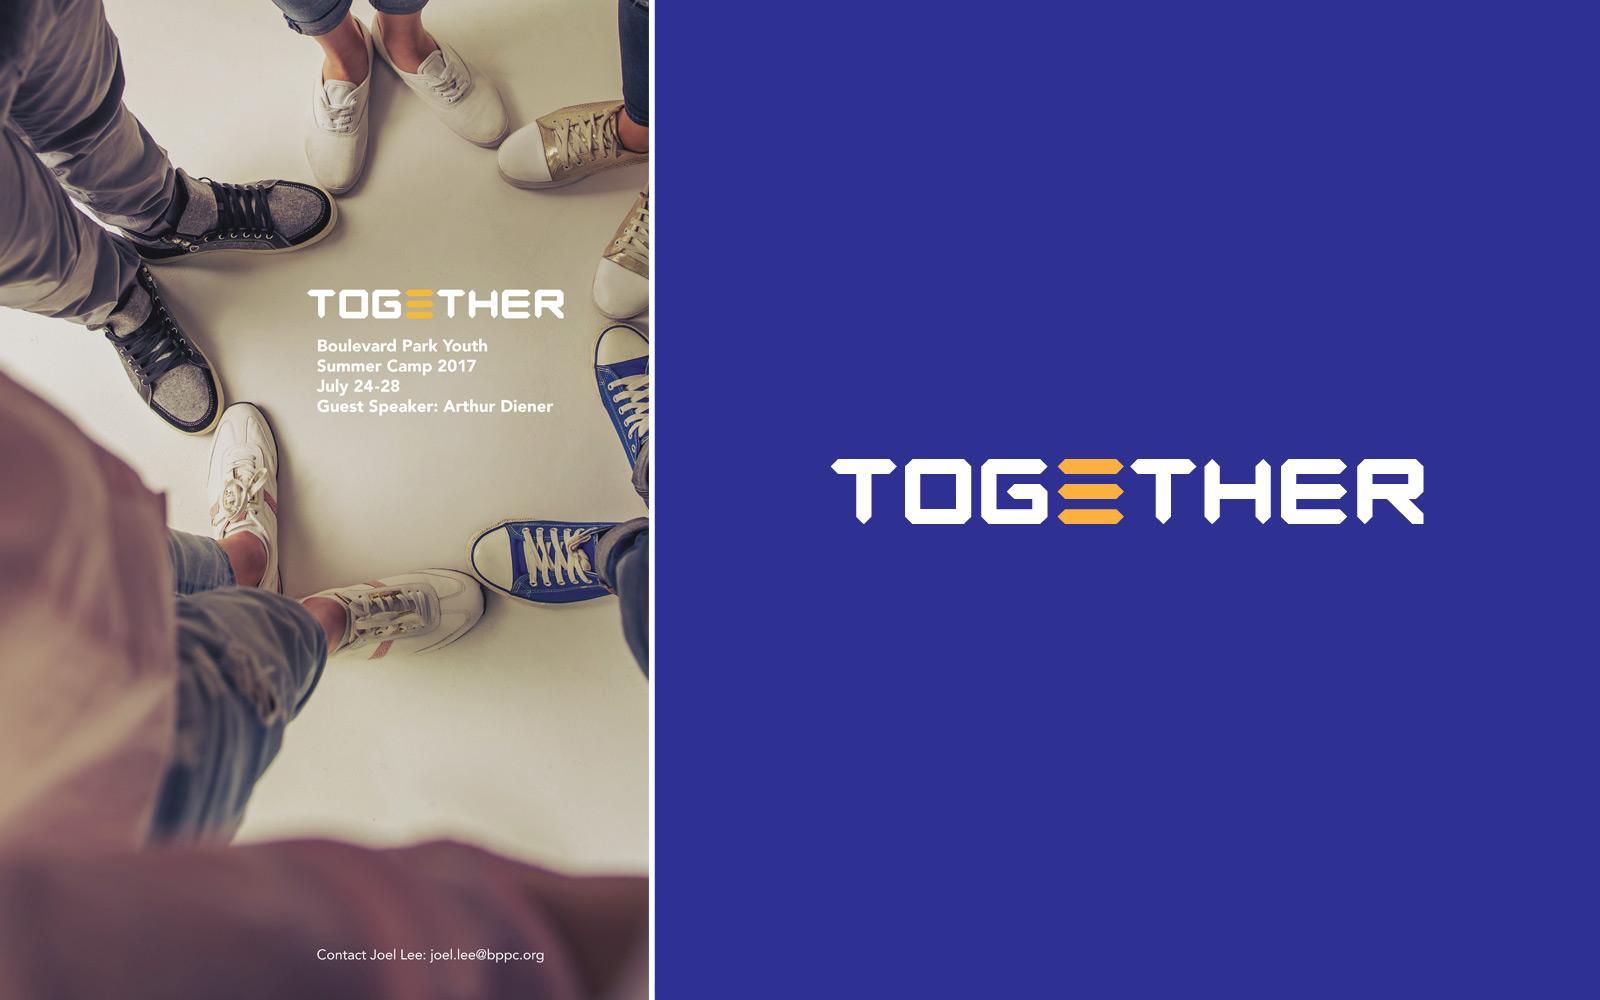 Logo and poster design for TOGETHER